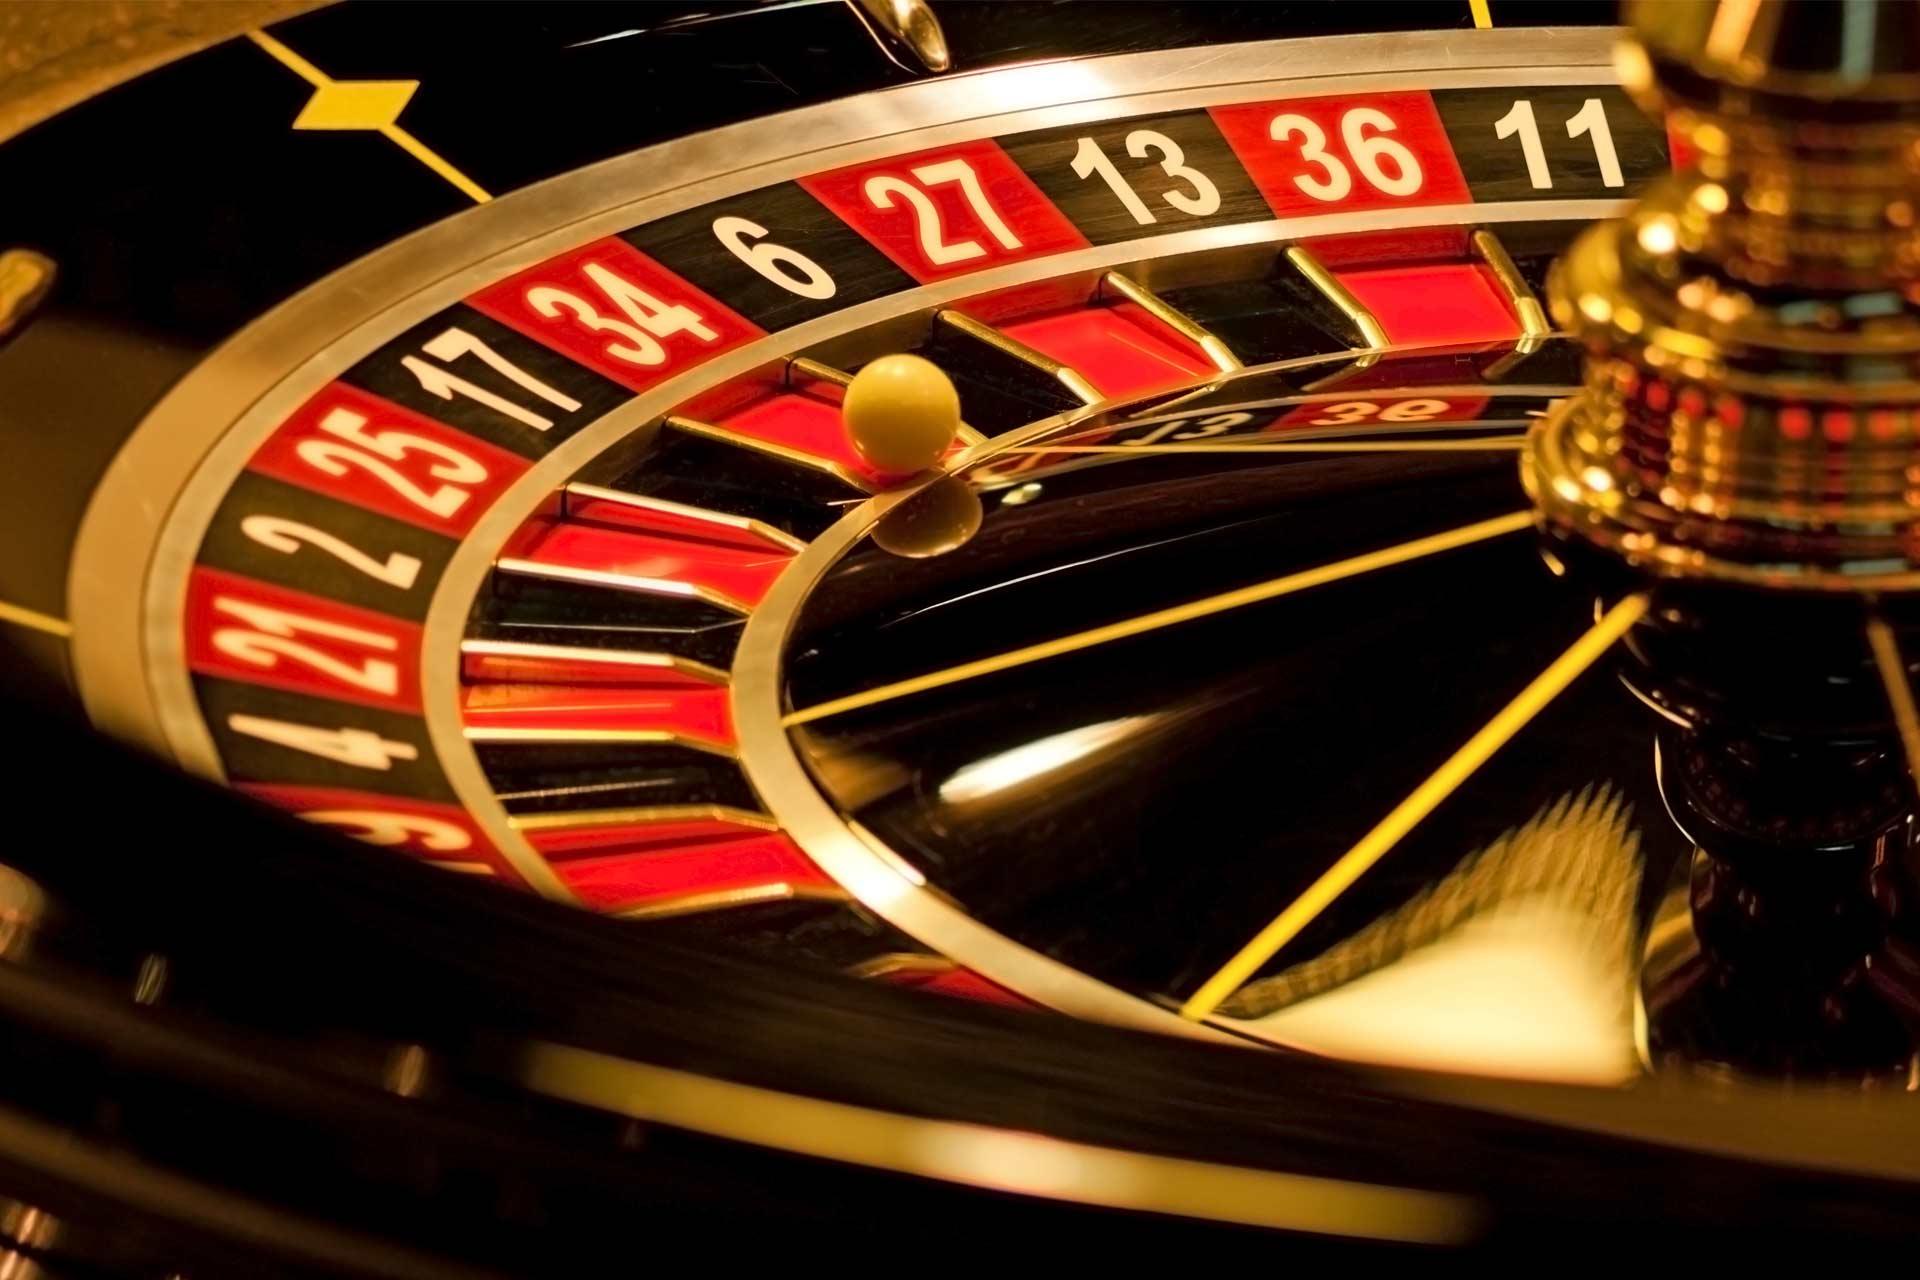 Casino machine at AVANI, Windhoek Hotel images